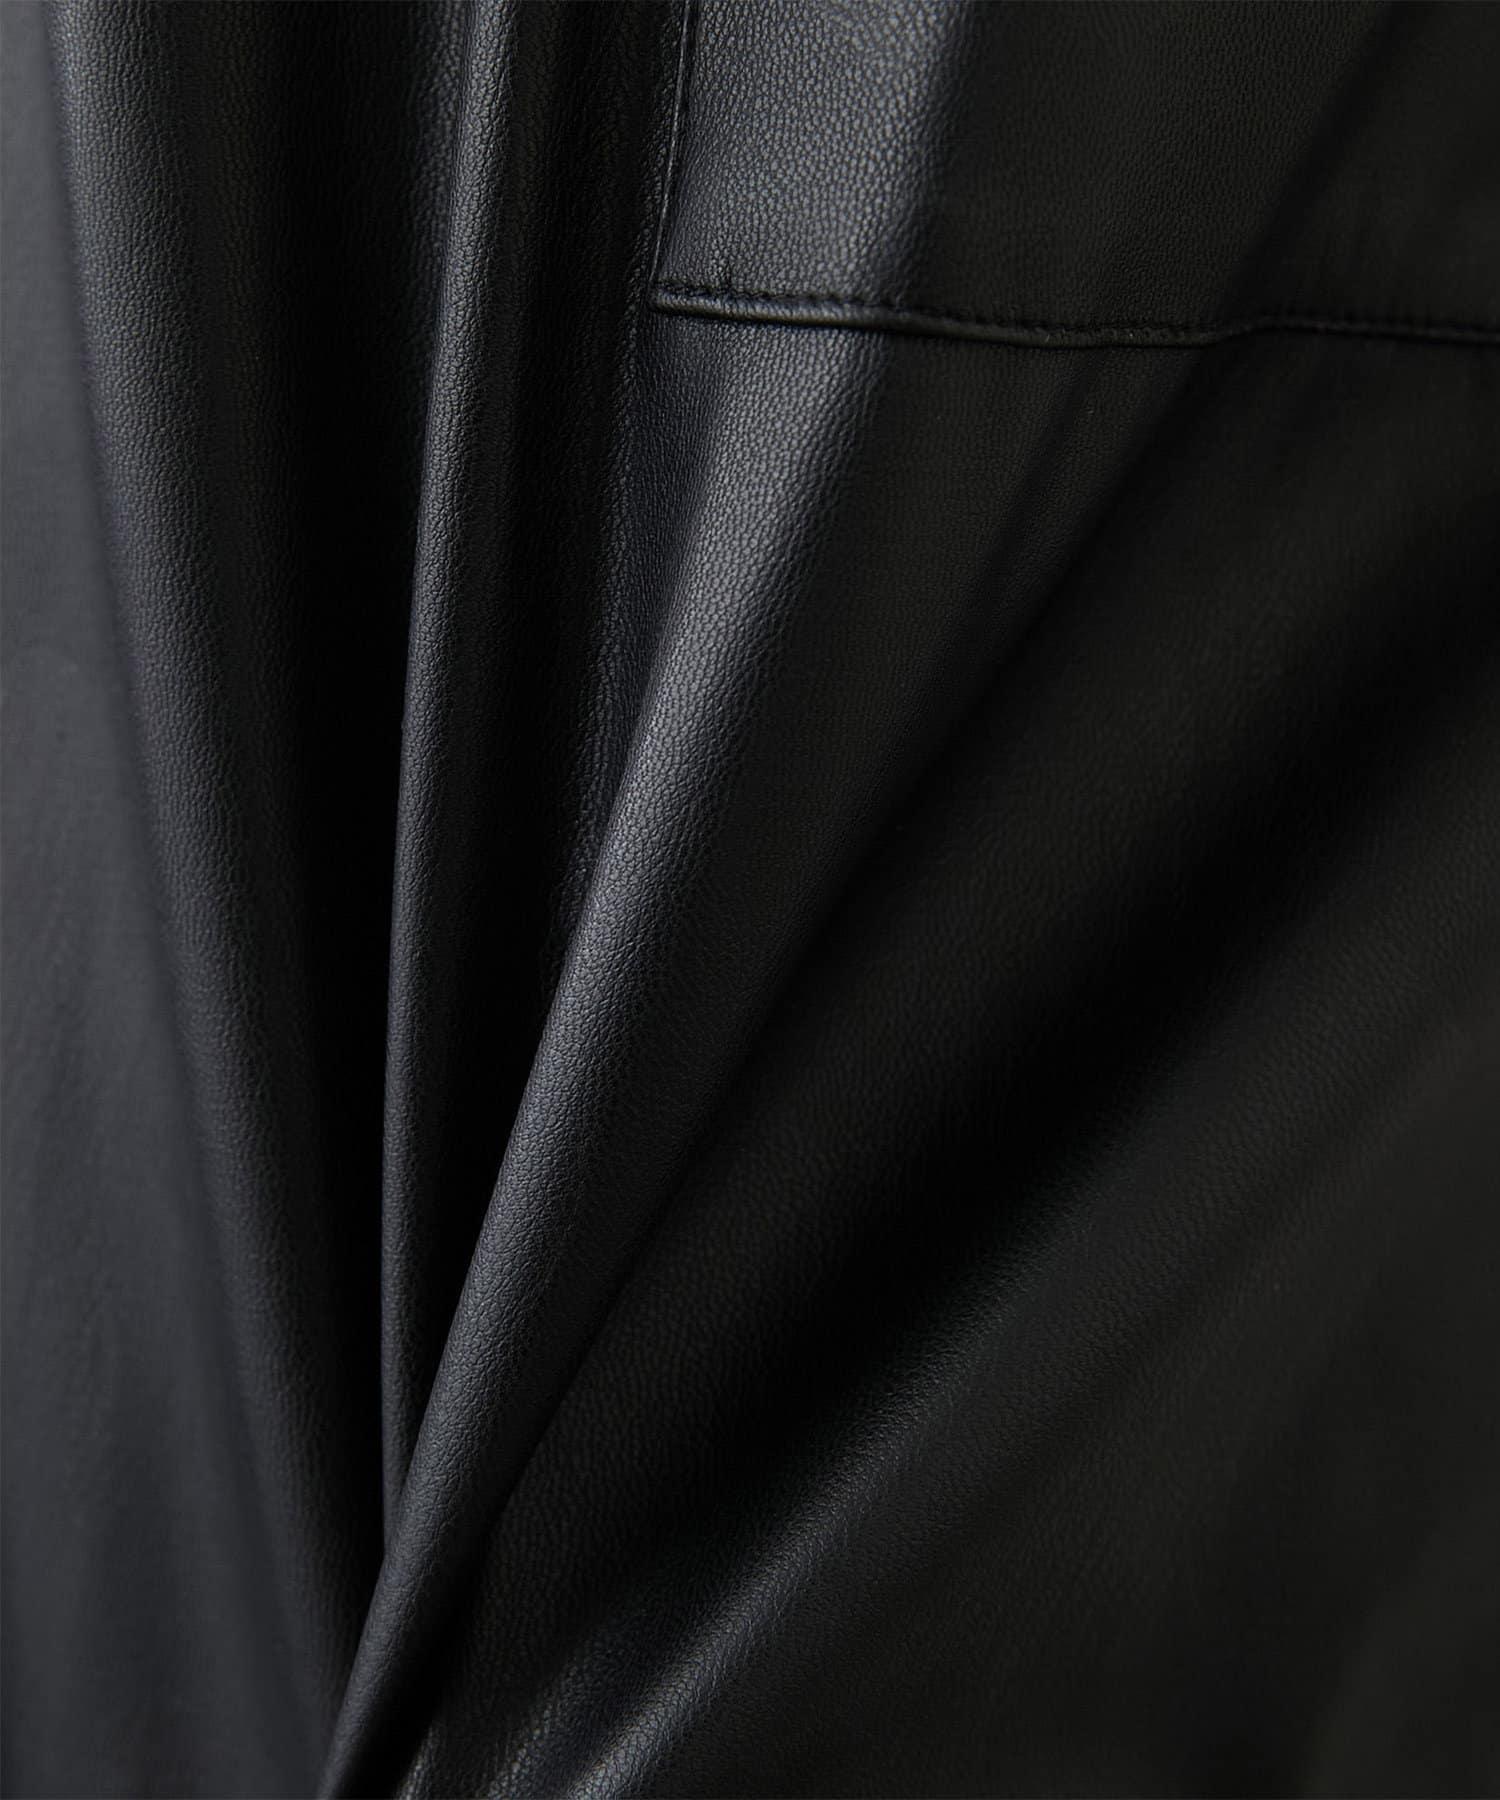 GALLARDAGALANTE(ガリャルダガランテ) フェイクレザーハーフパンツ【オンラインストア限定商品】